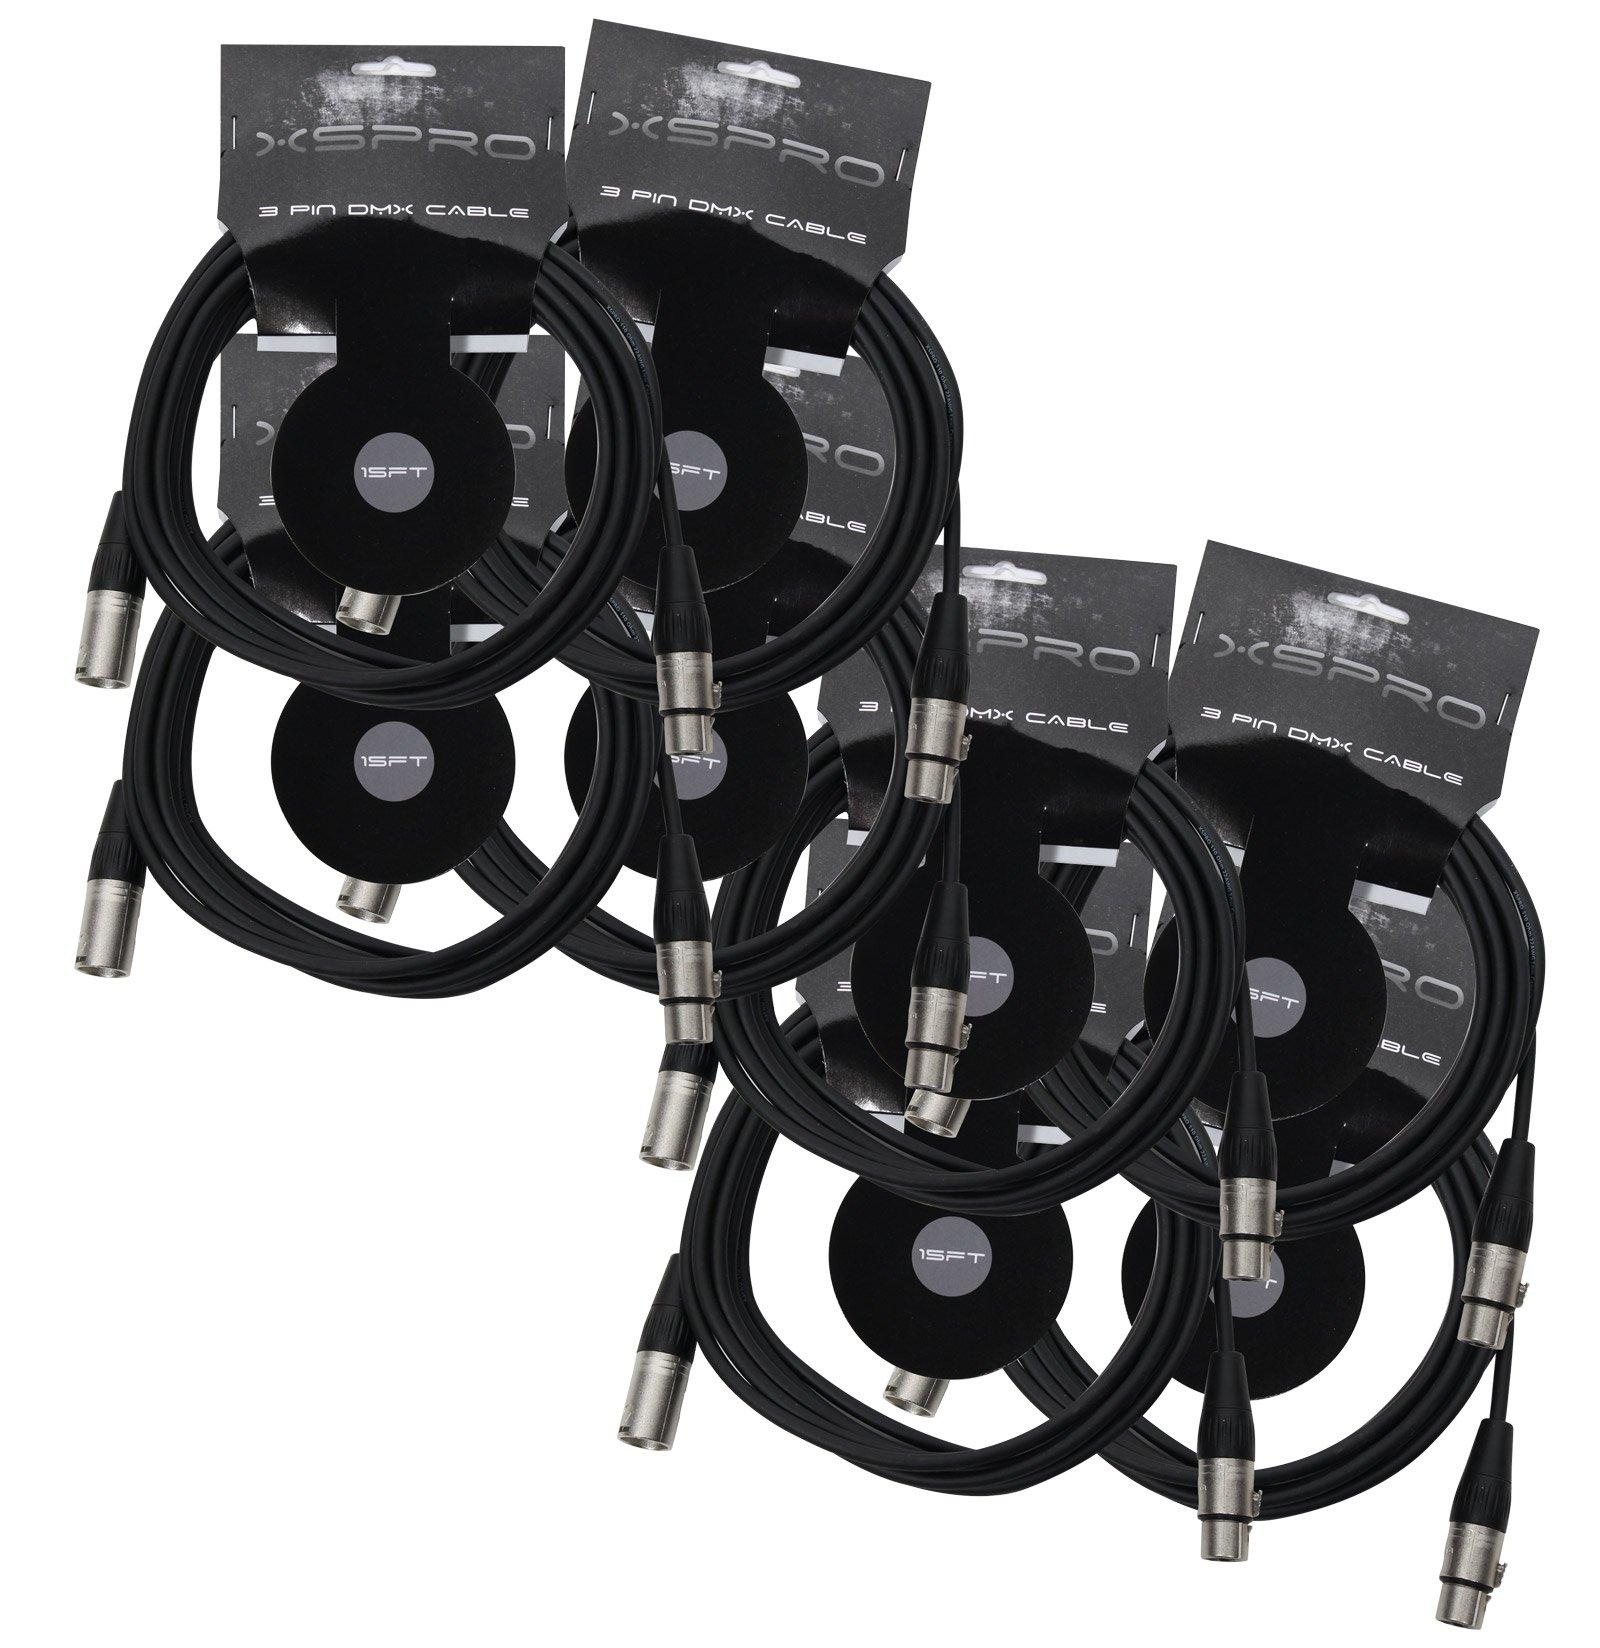 XSPRO XSPDMX3P15 3 Pin DMX Light Cable 15' - 8PAK by XSPRO